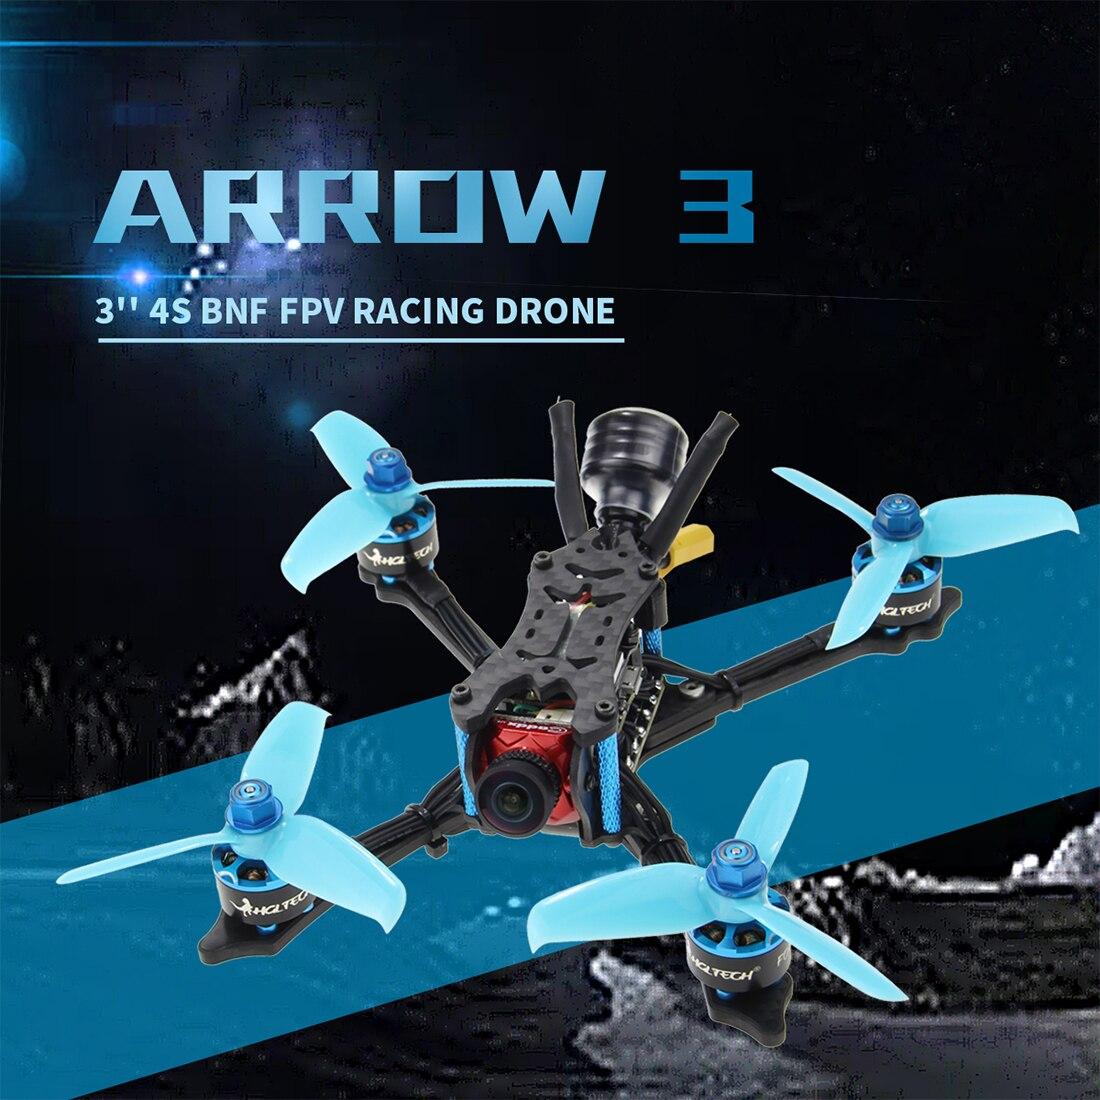 HGLRC Arrow3 152mm 3 Inch F4 OSD 4S / 6S Mini FPV Racing Drone PNP BNF with 45A ESC Caddx Ratel 1200TVL Camera RC Quadcopter - 6